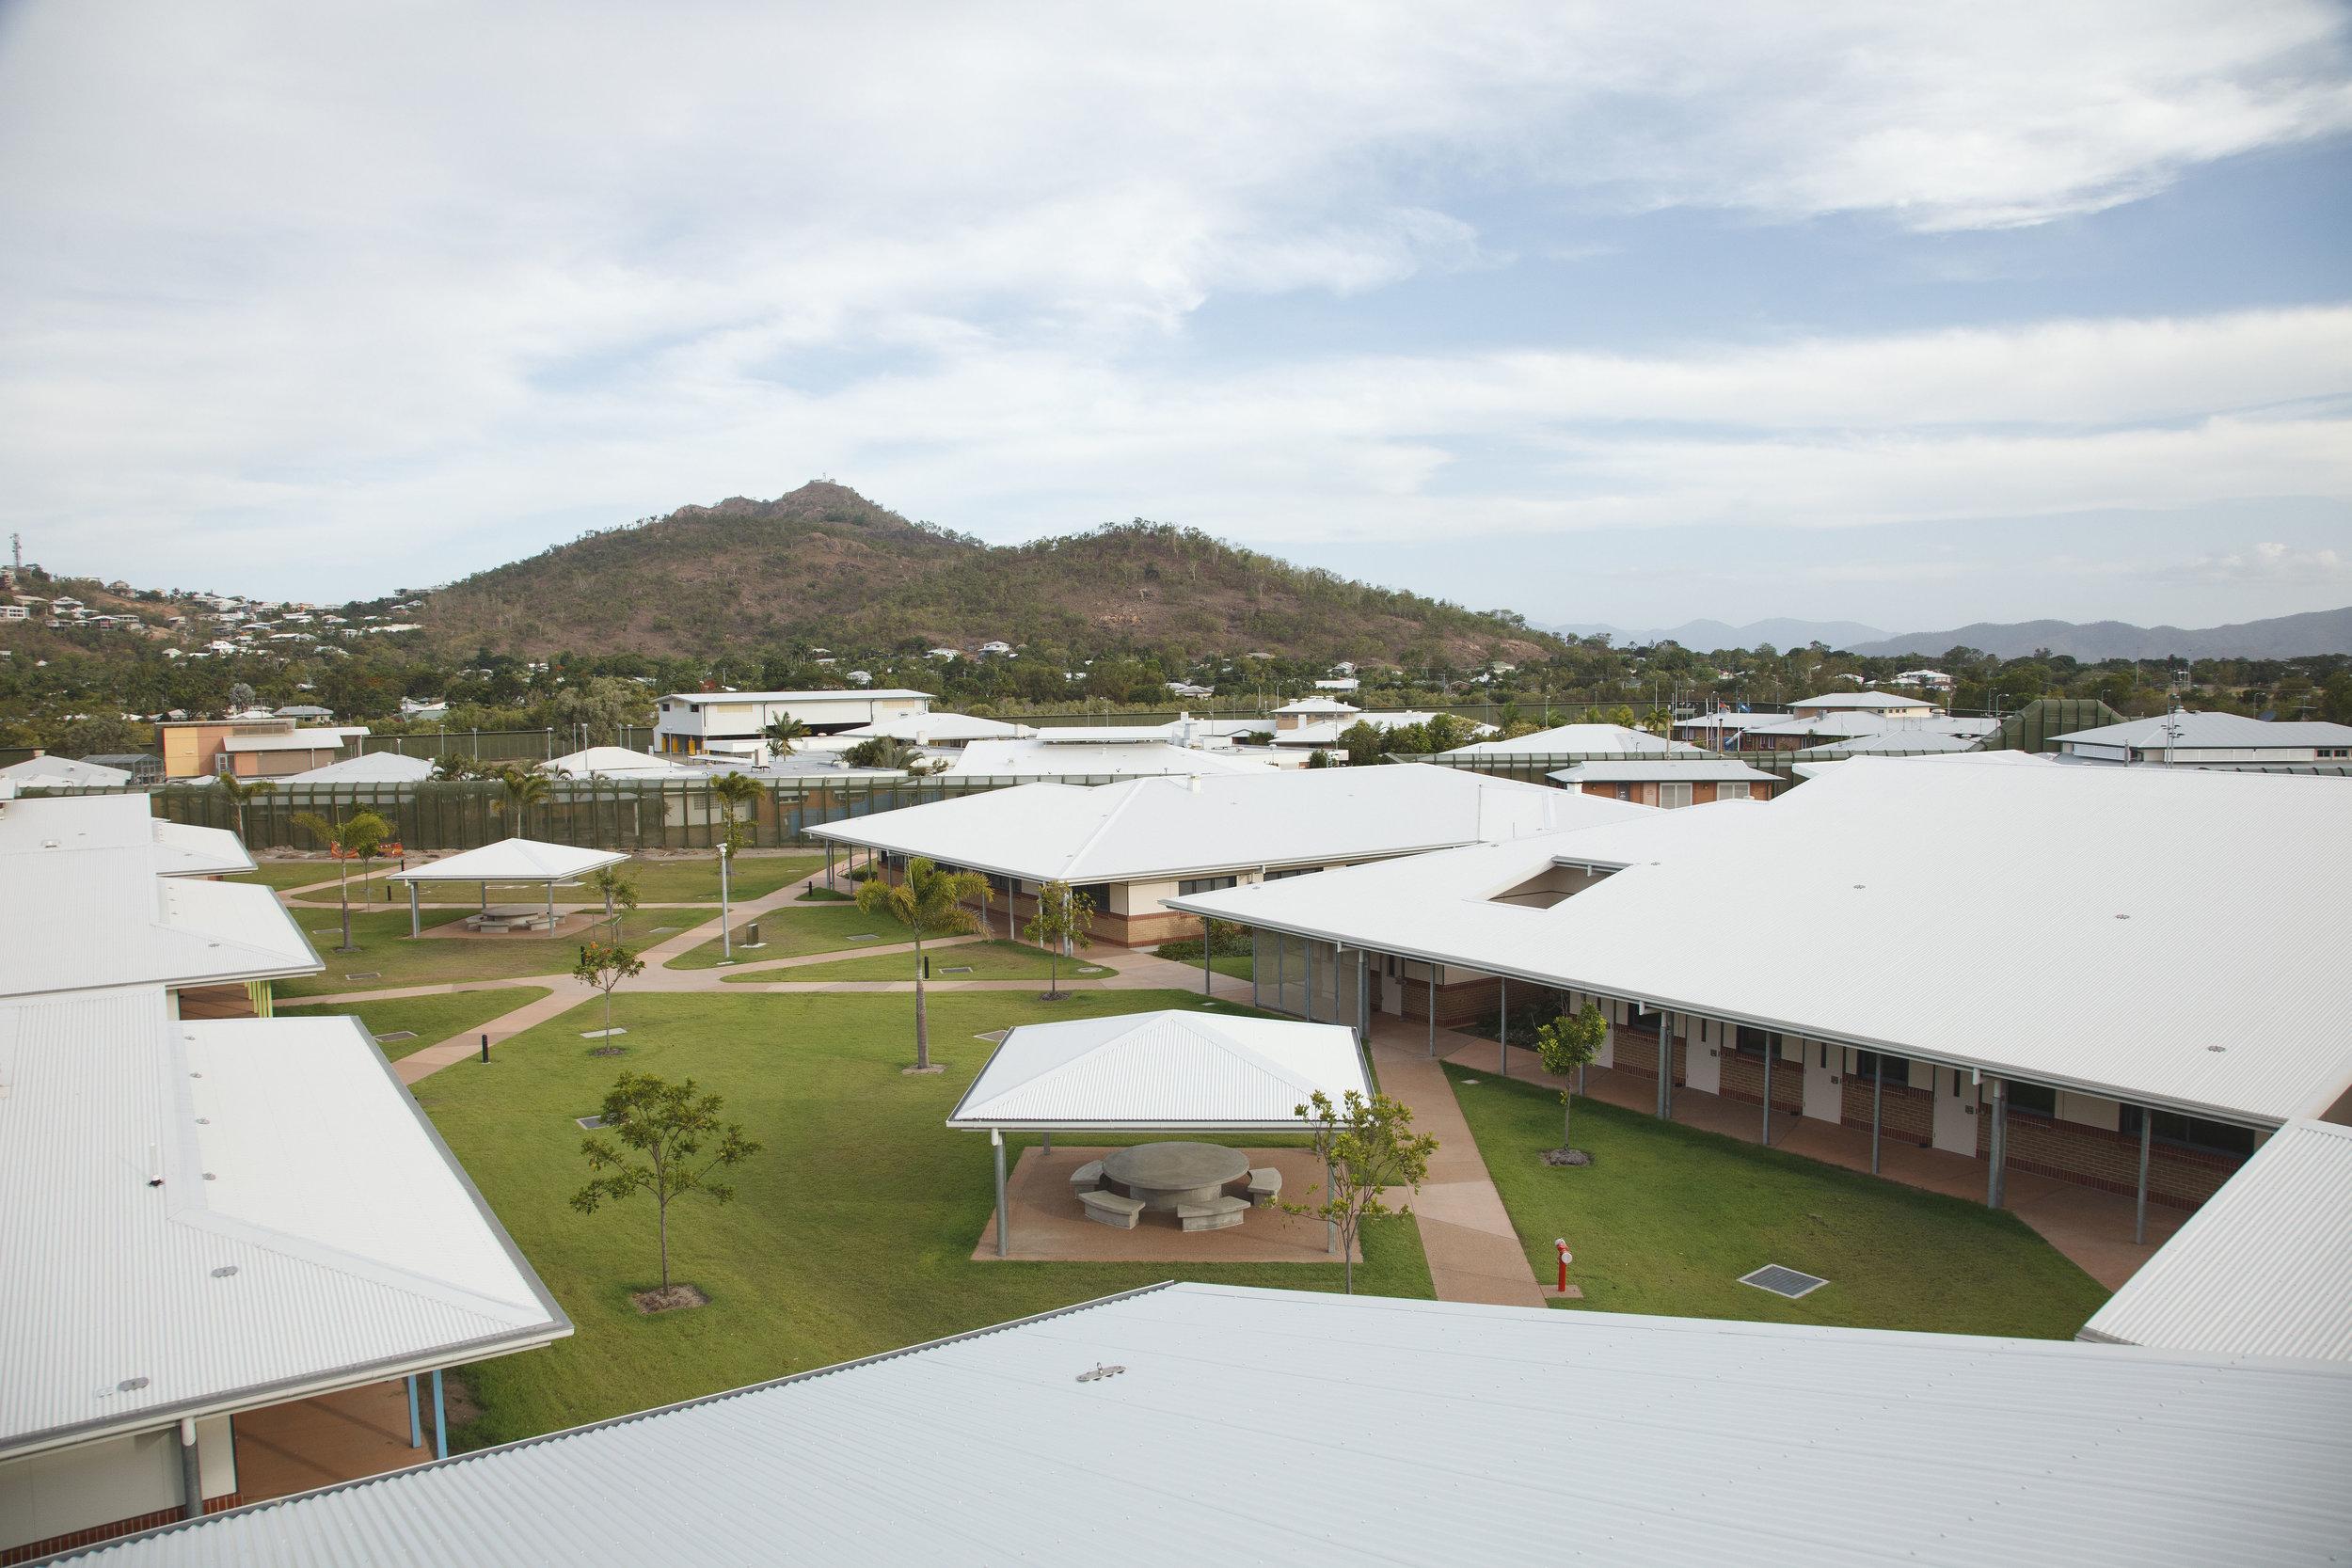 Far-north-qld-youth-detention-guymer-bailey-landscape-1.jpg